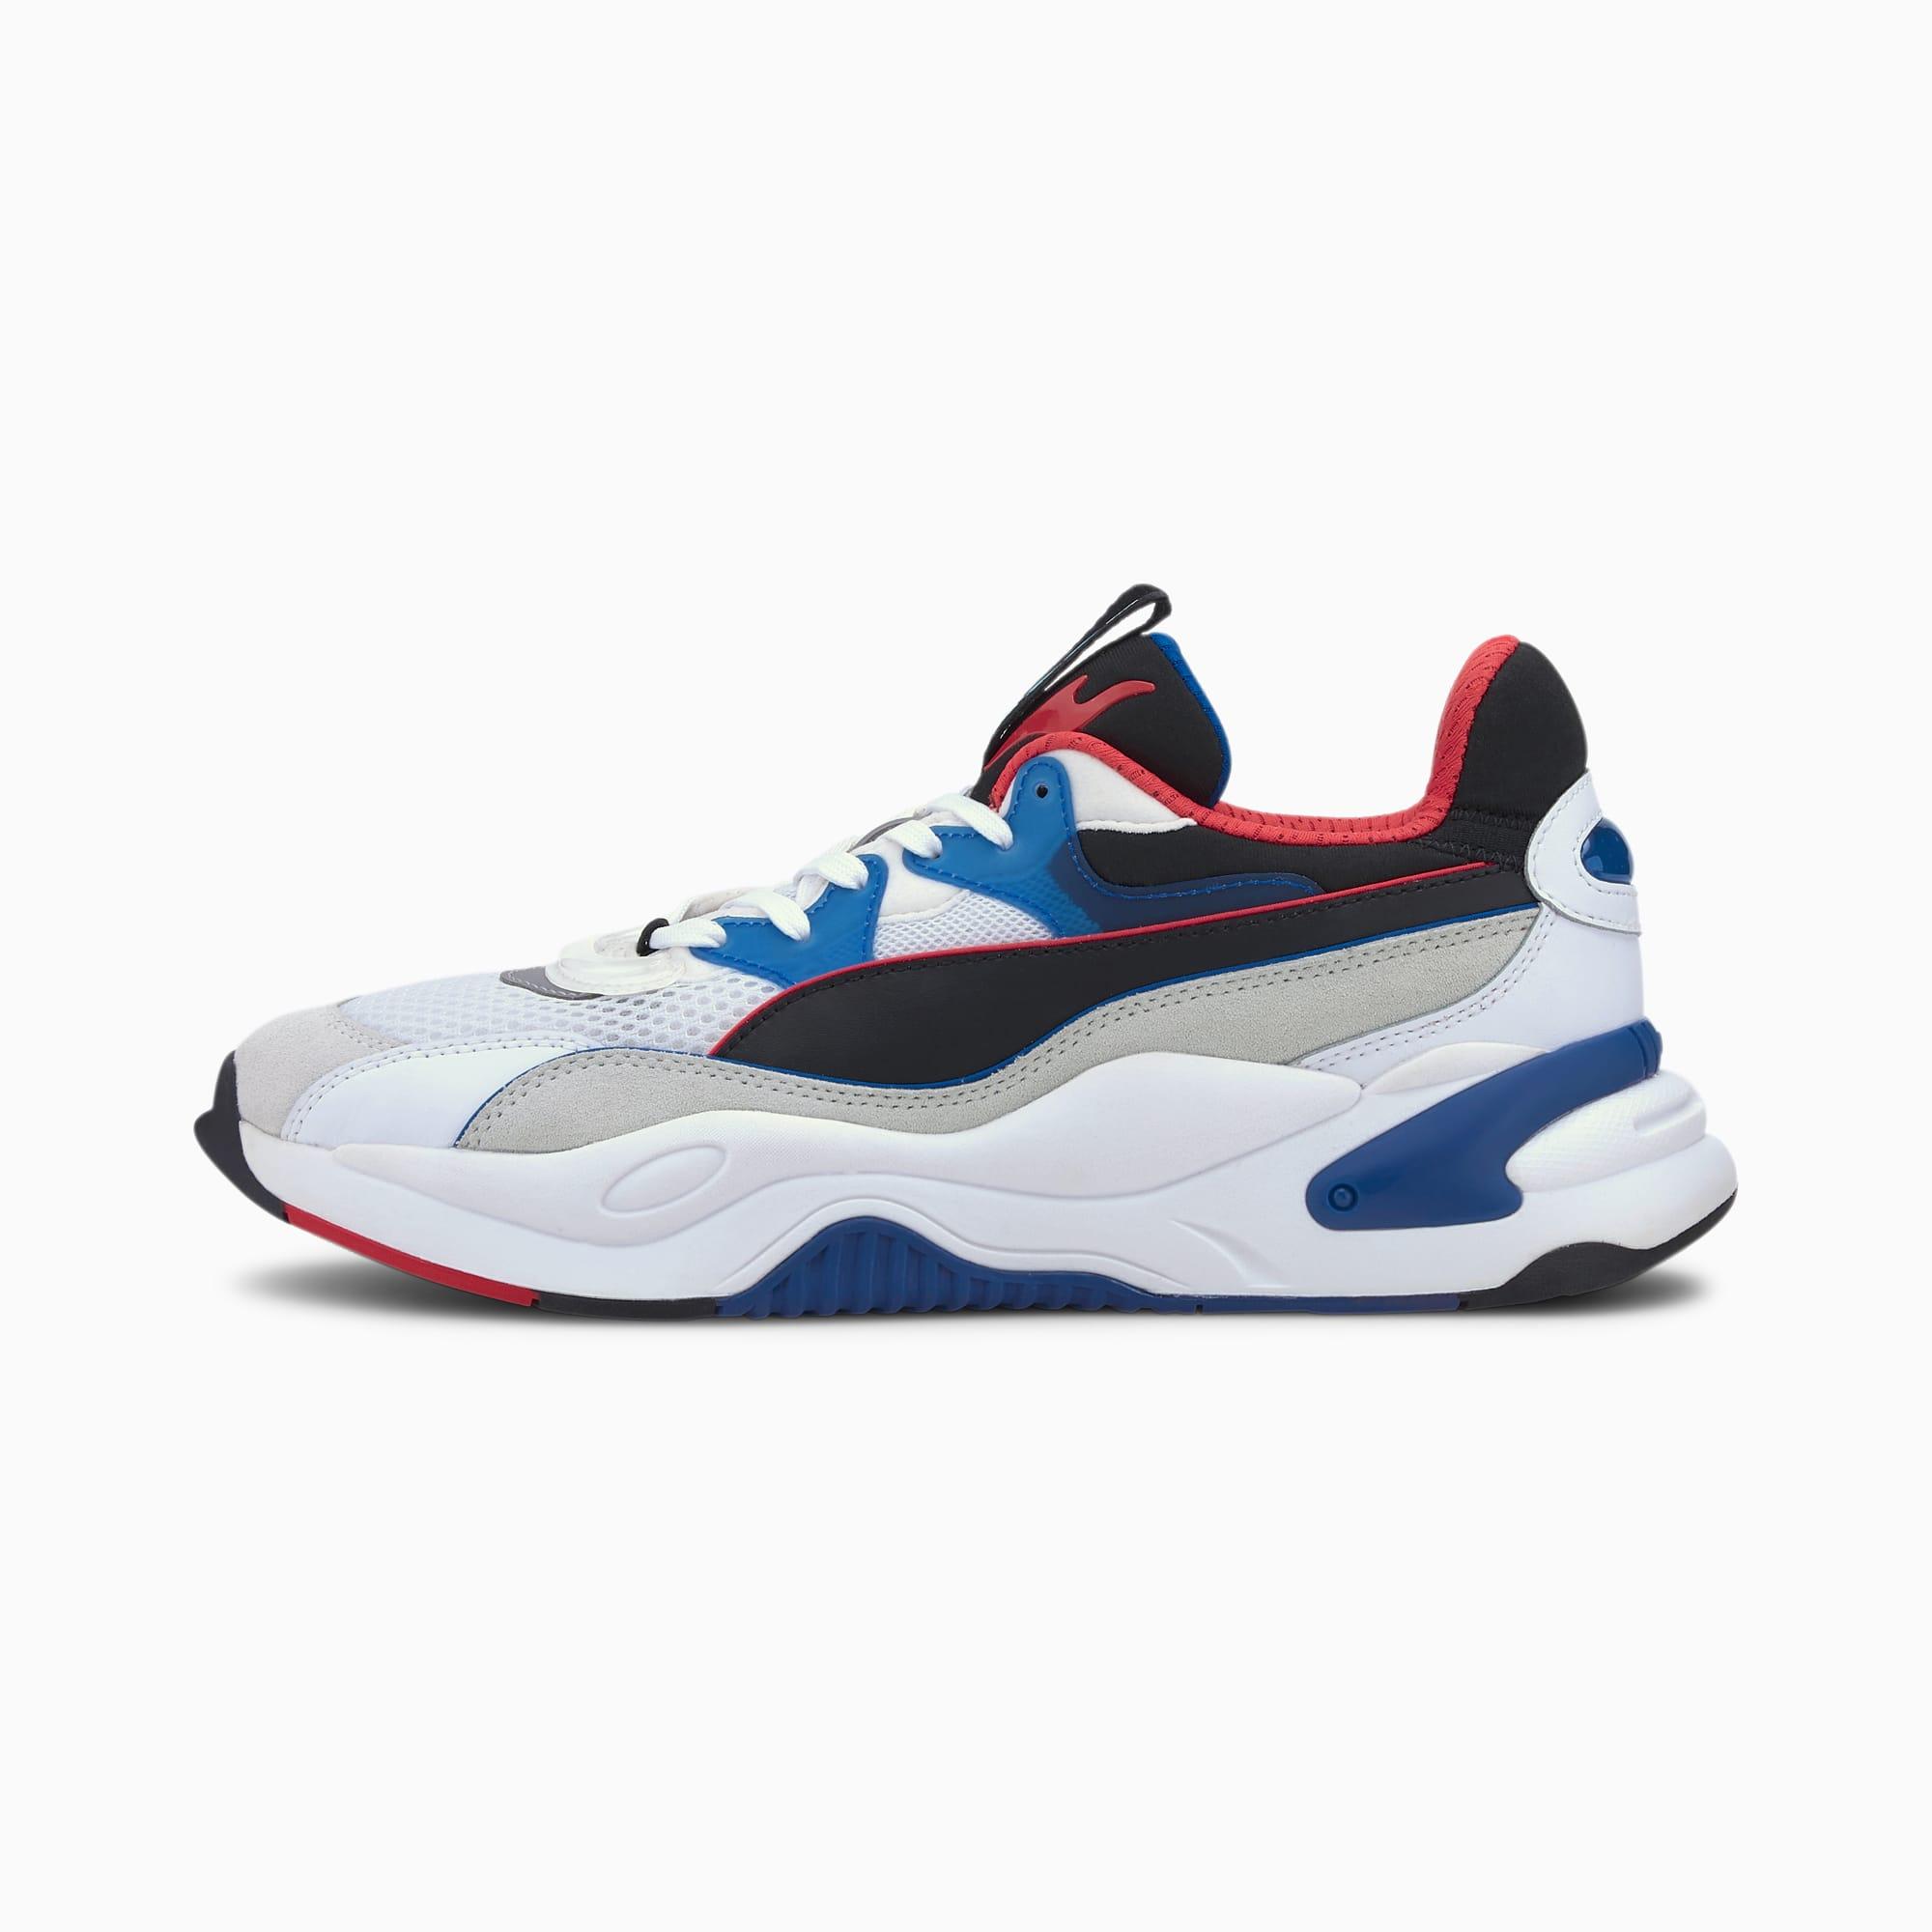 PUMA Chaussure Basket RS-2K Internet Exploring, Blanc/Bleu, Taille 36, Chaussures